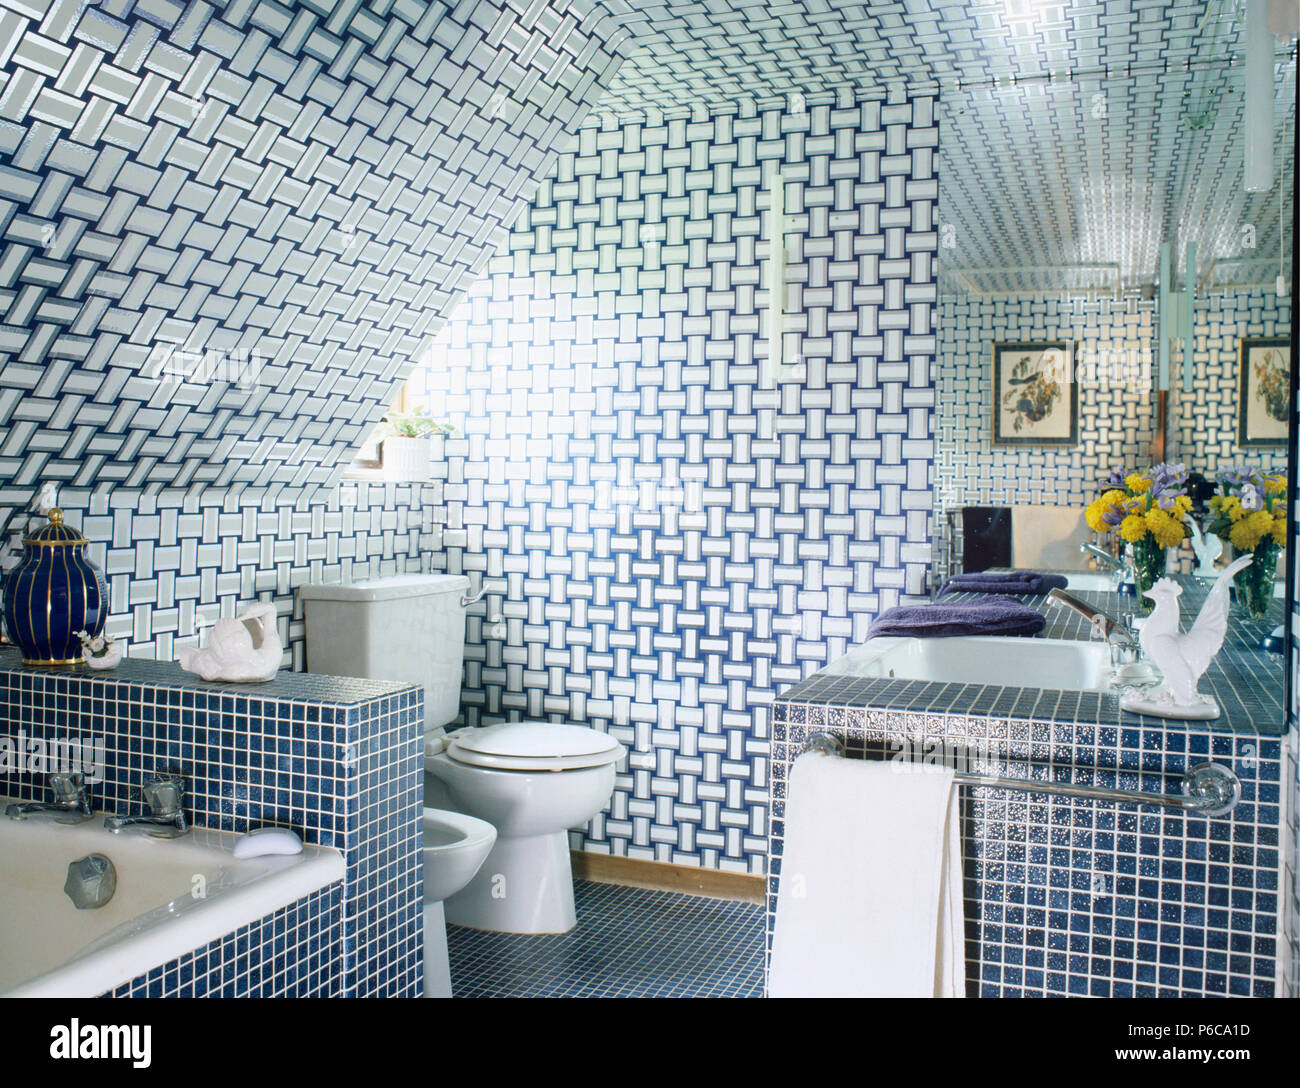 Retro Tiling Stock Photos & Retro Tiling Stock Images - Alamy